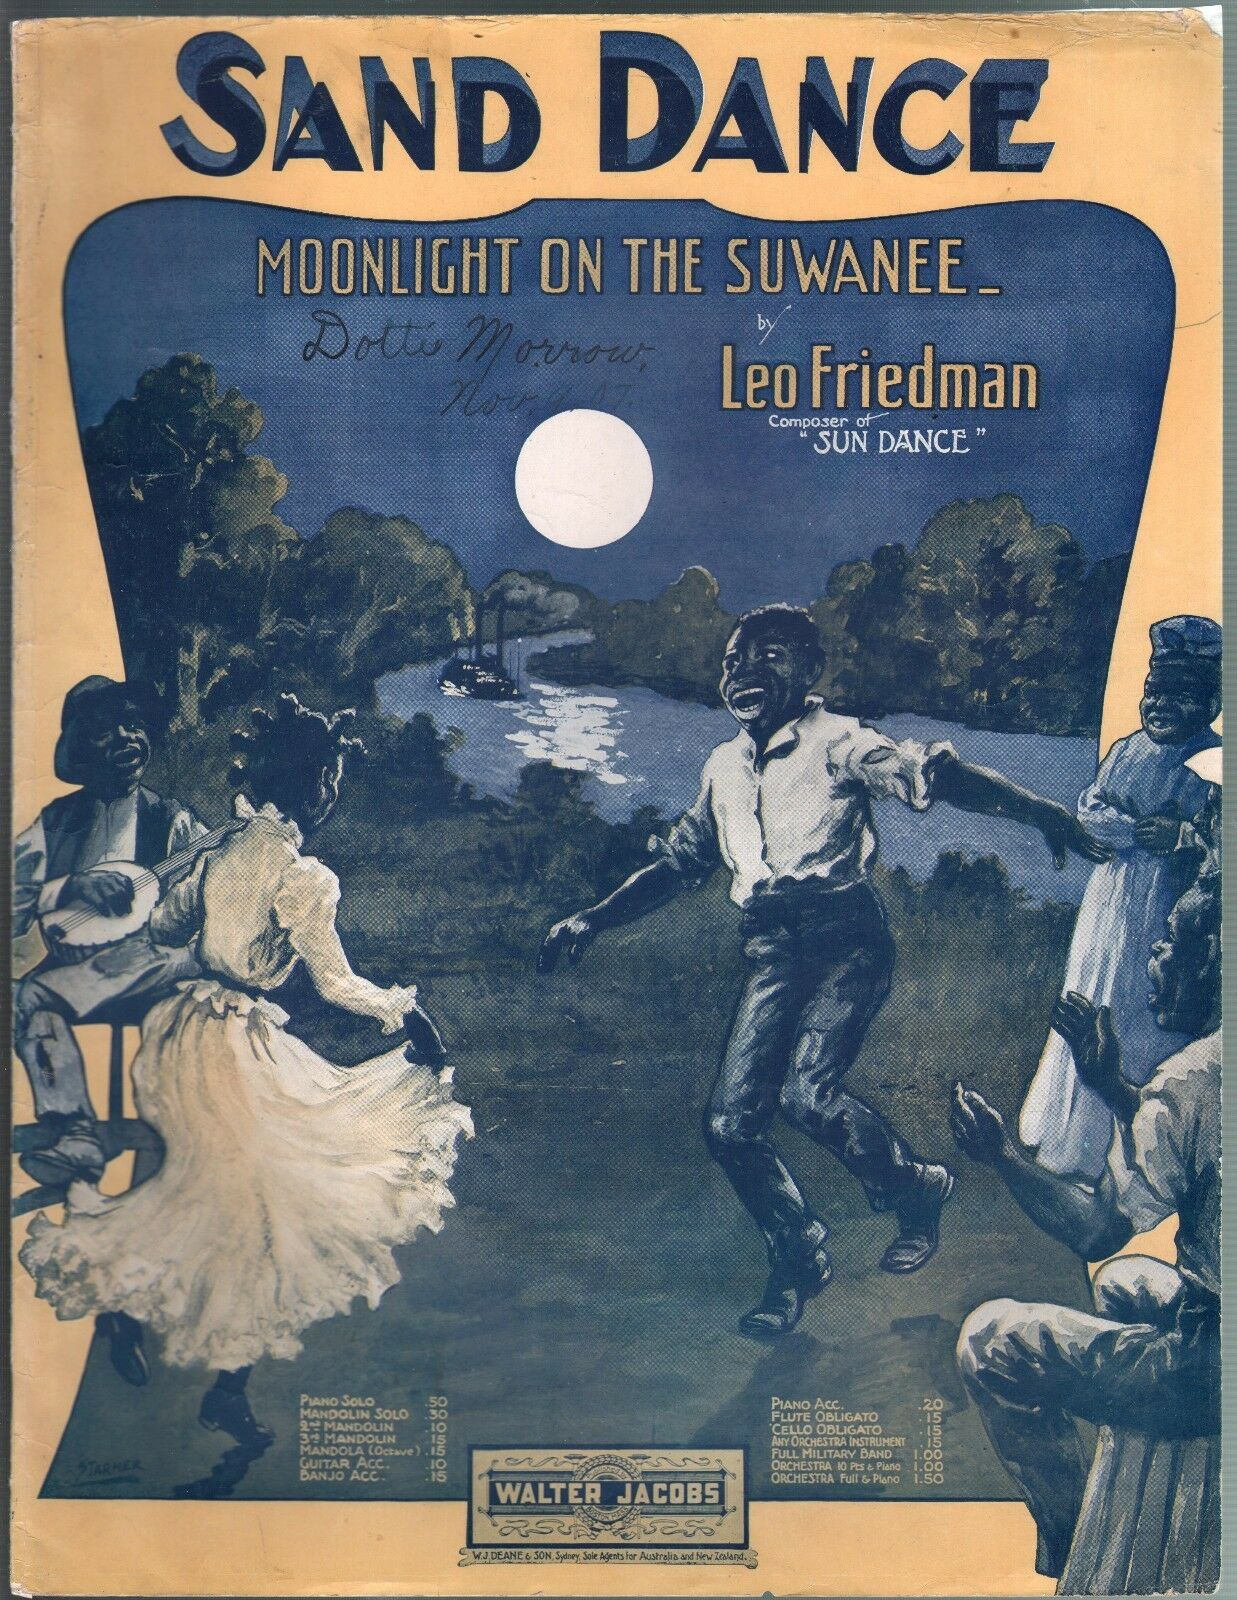 Sand Dance 1907 Large Format Sheet Music